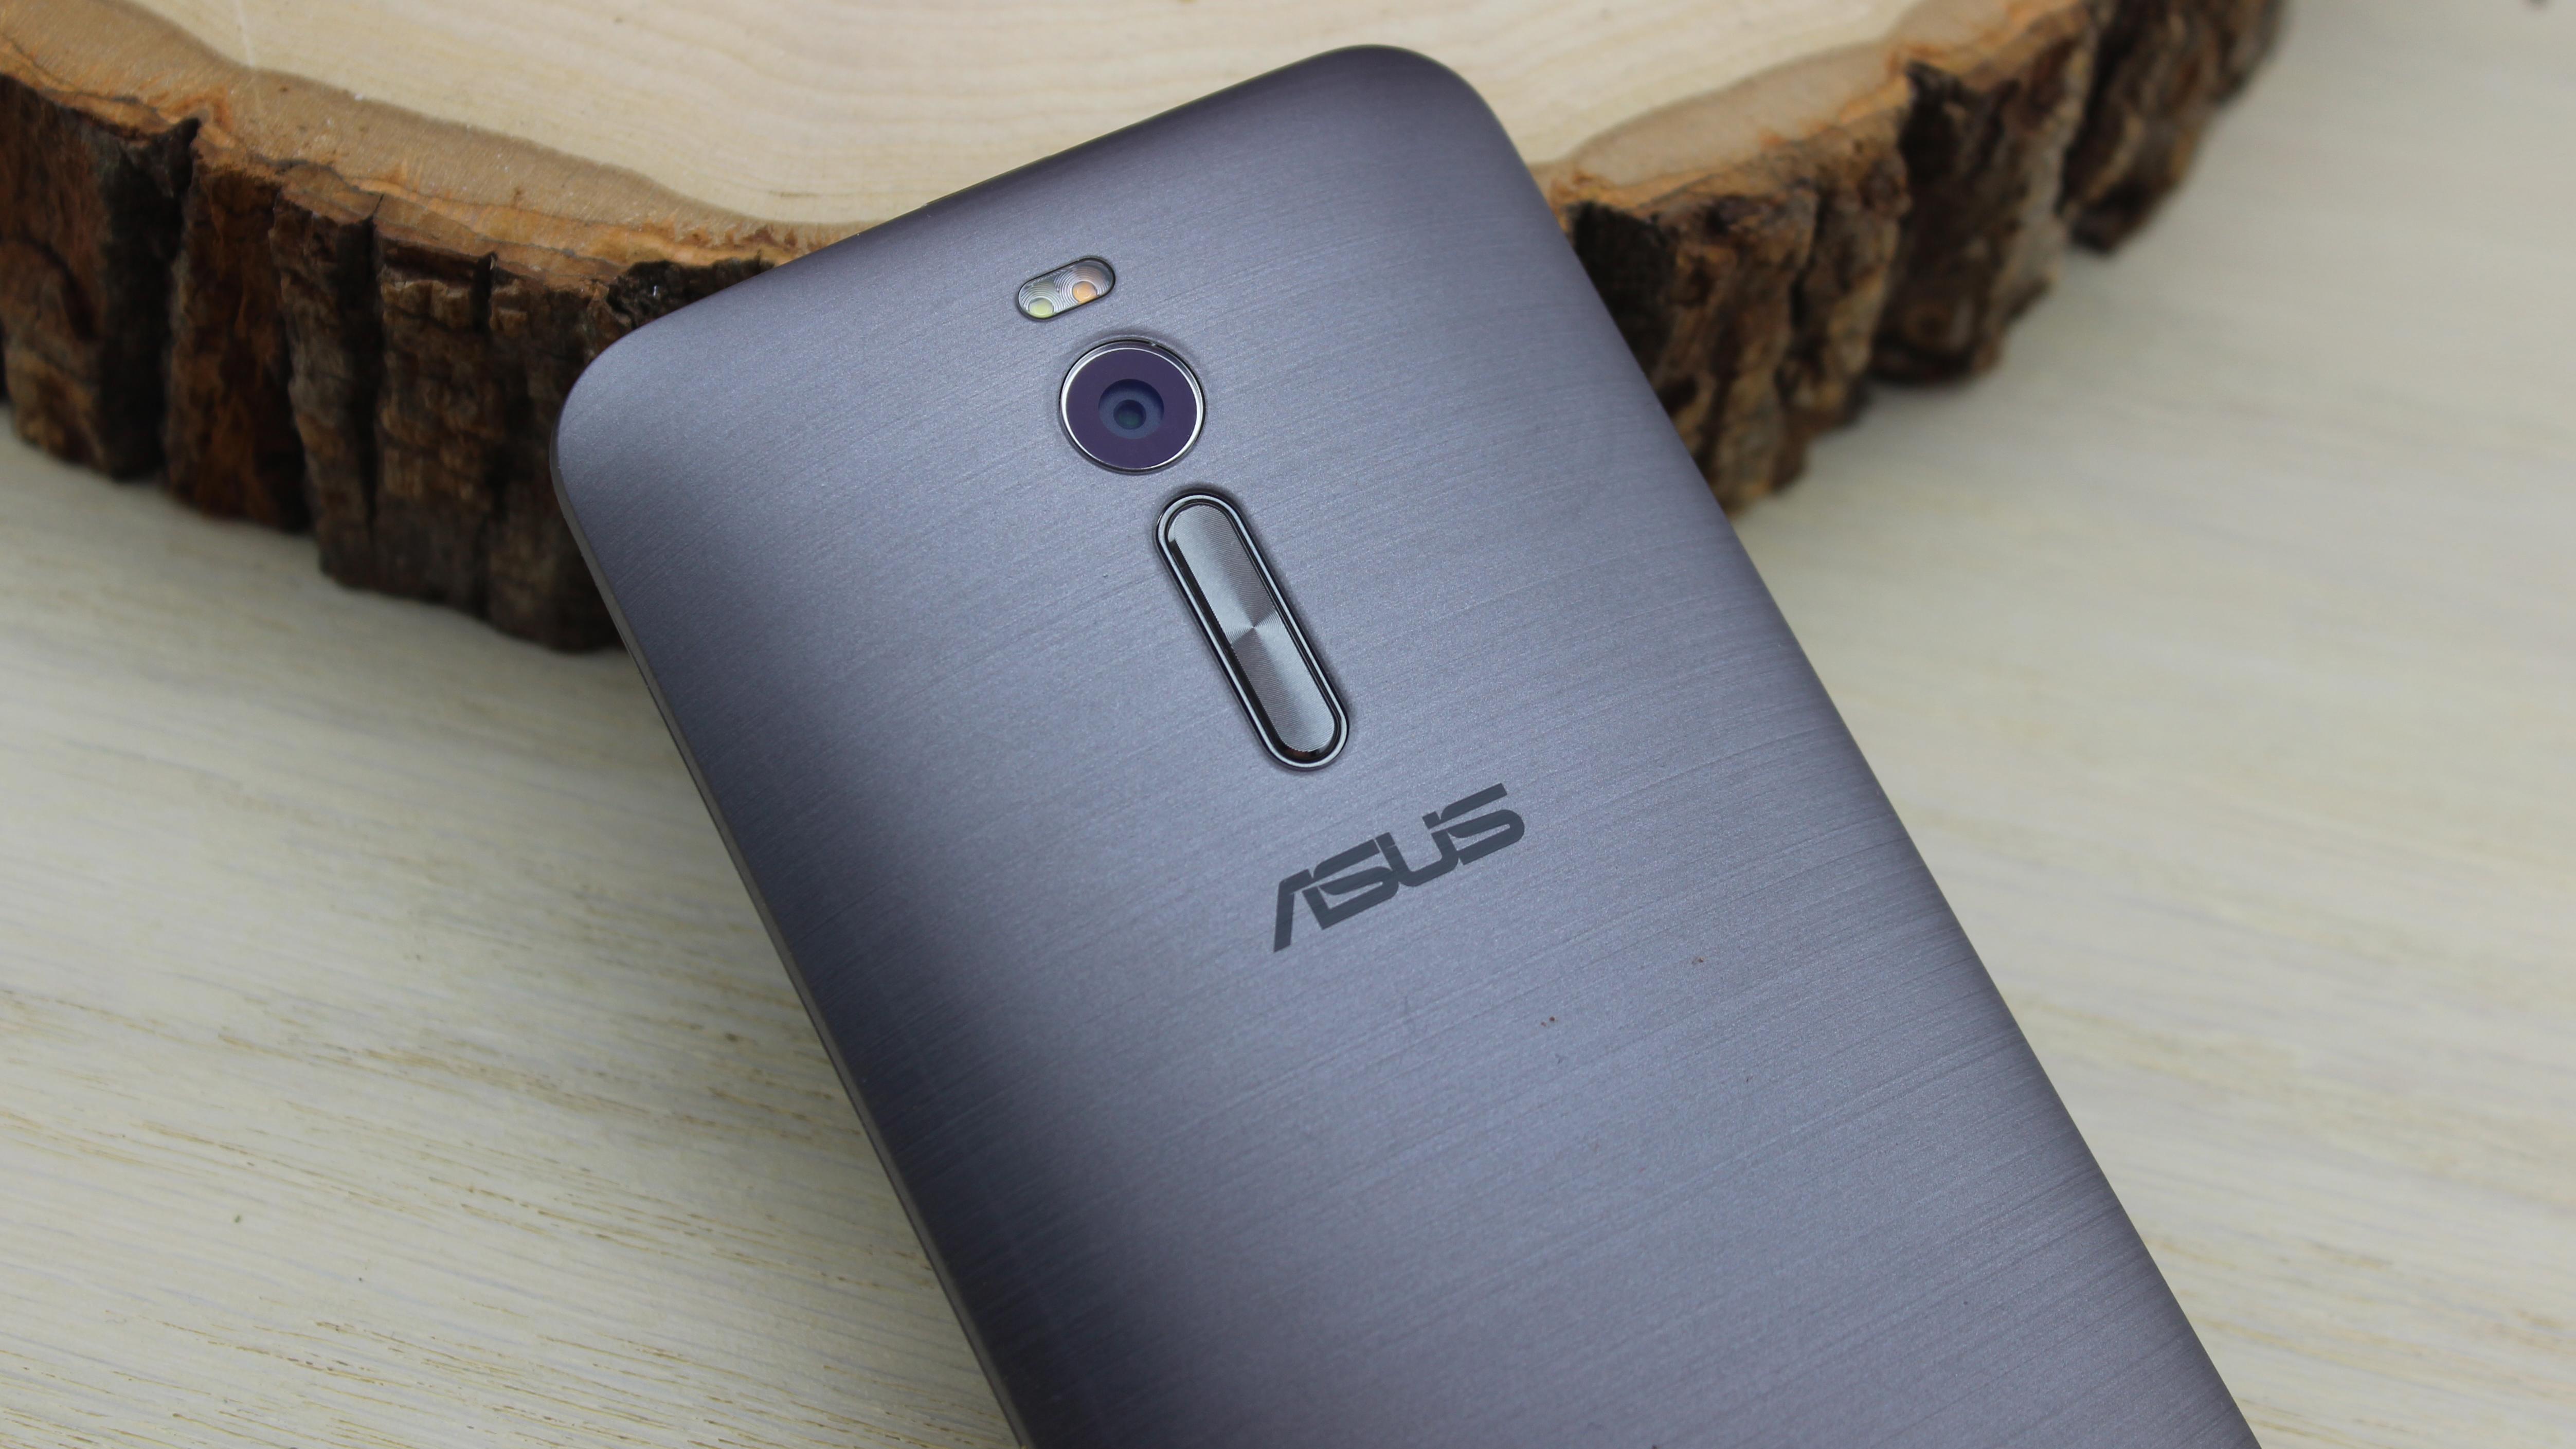 Asus Zenfone 2 Techradar Ze551ml Ram 4gb Rom 32gb